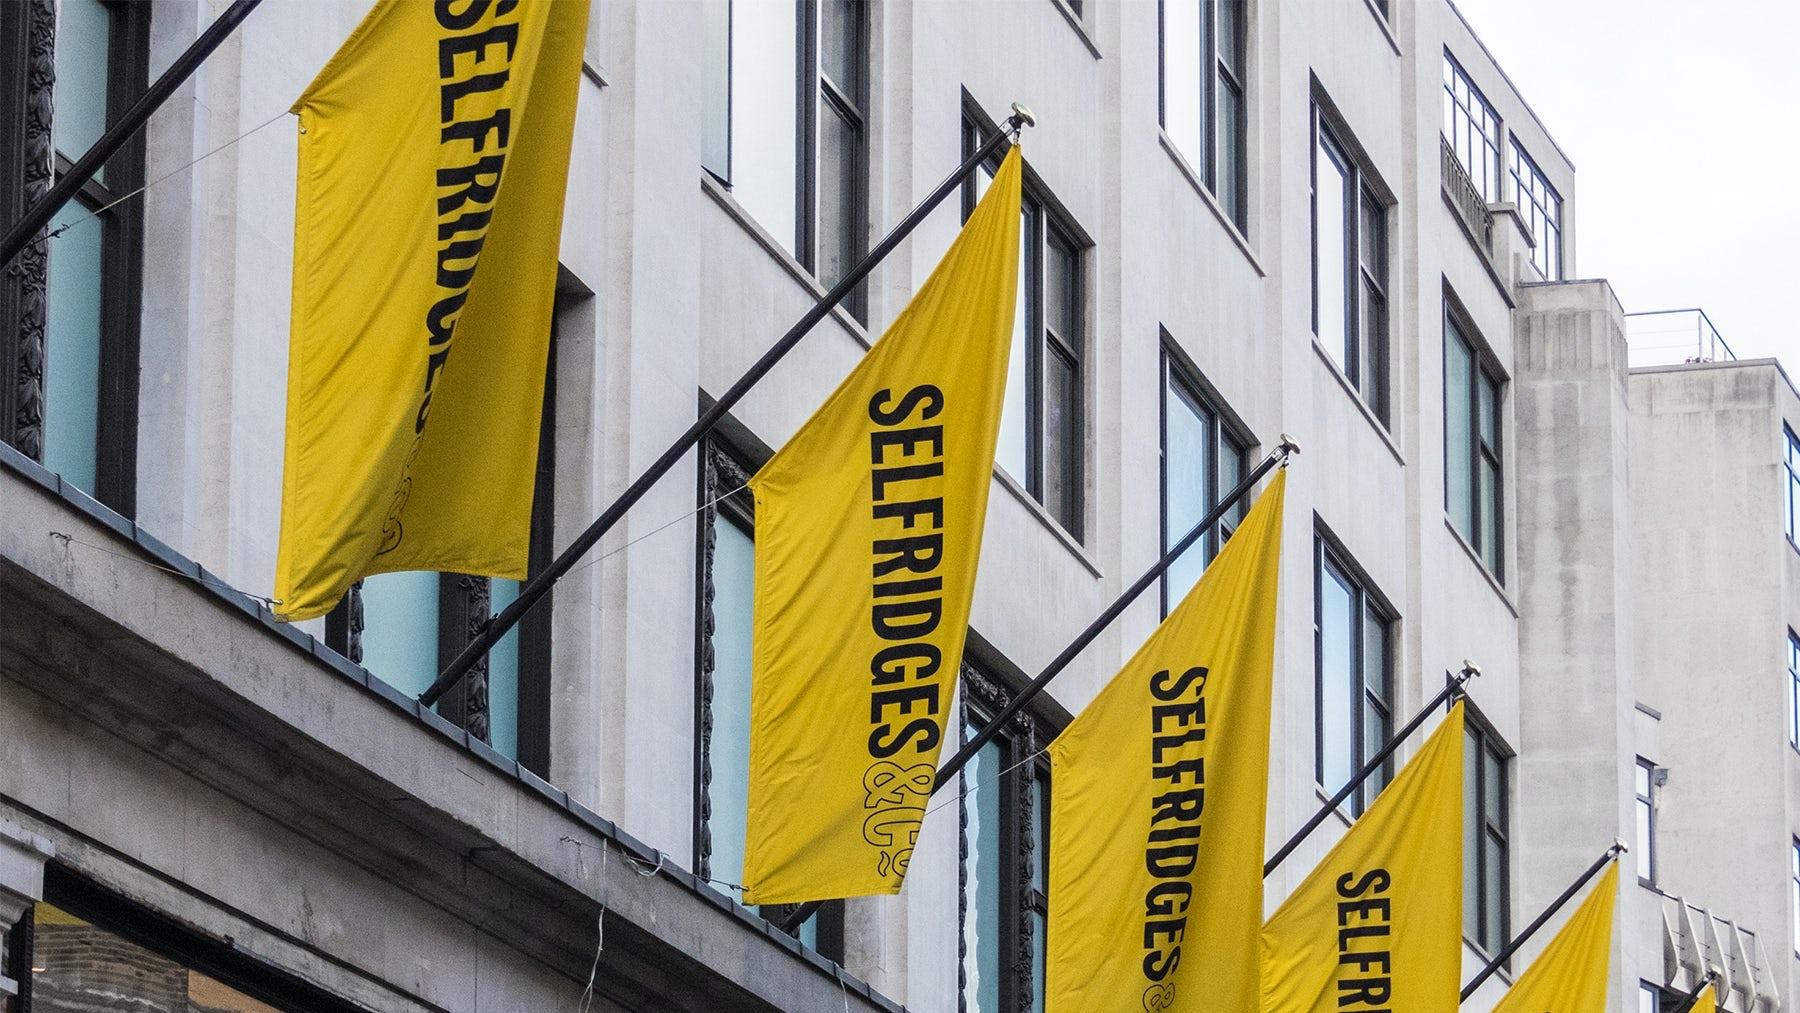 Selfridges. Shutterstock.